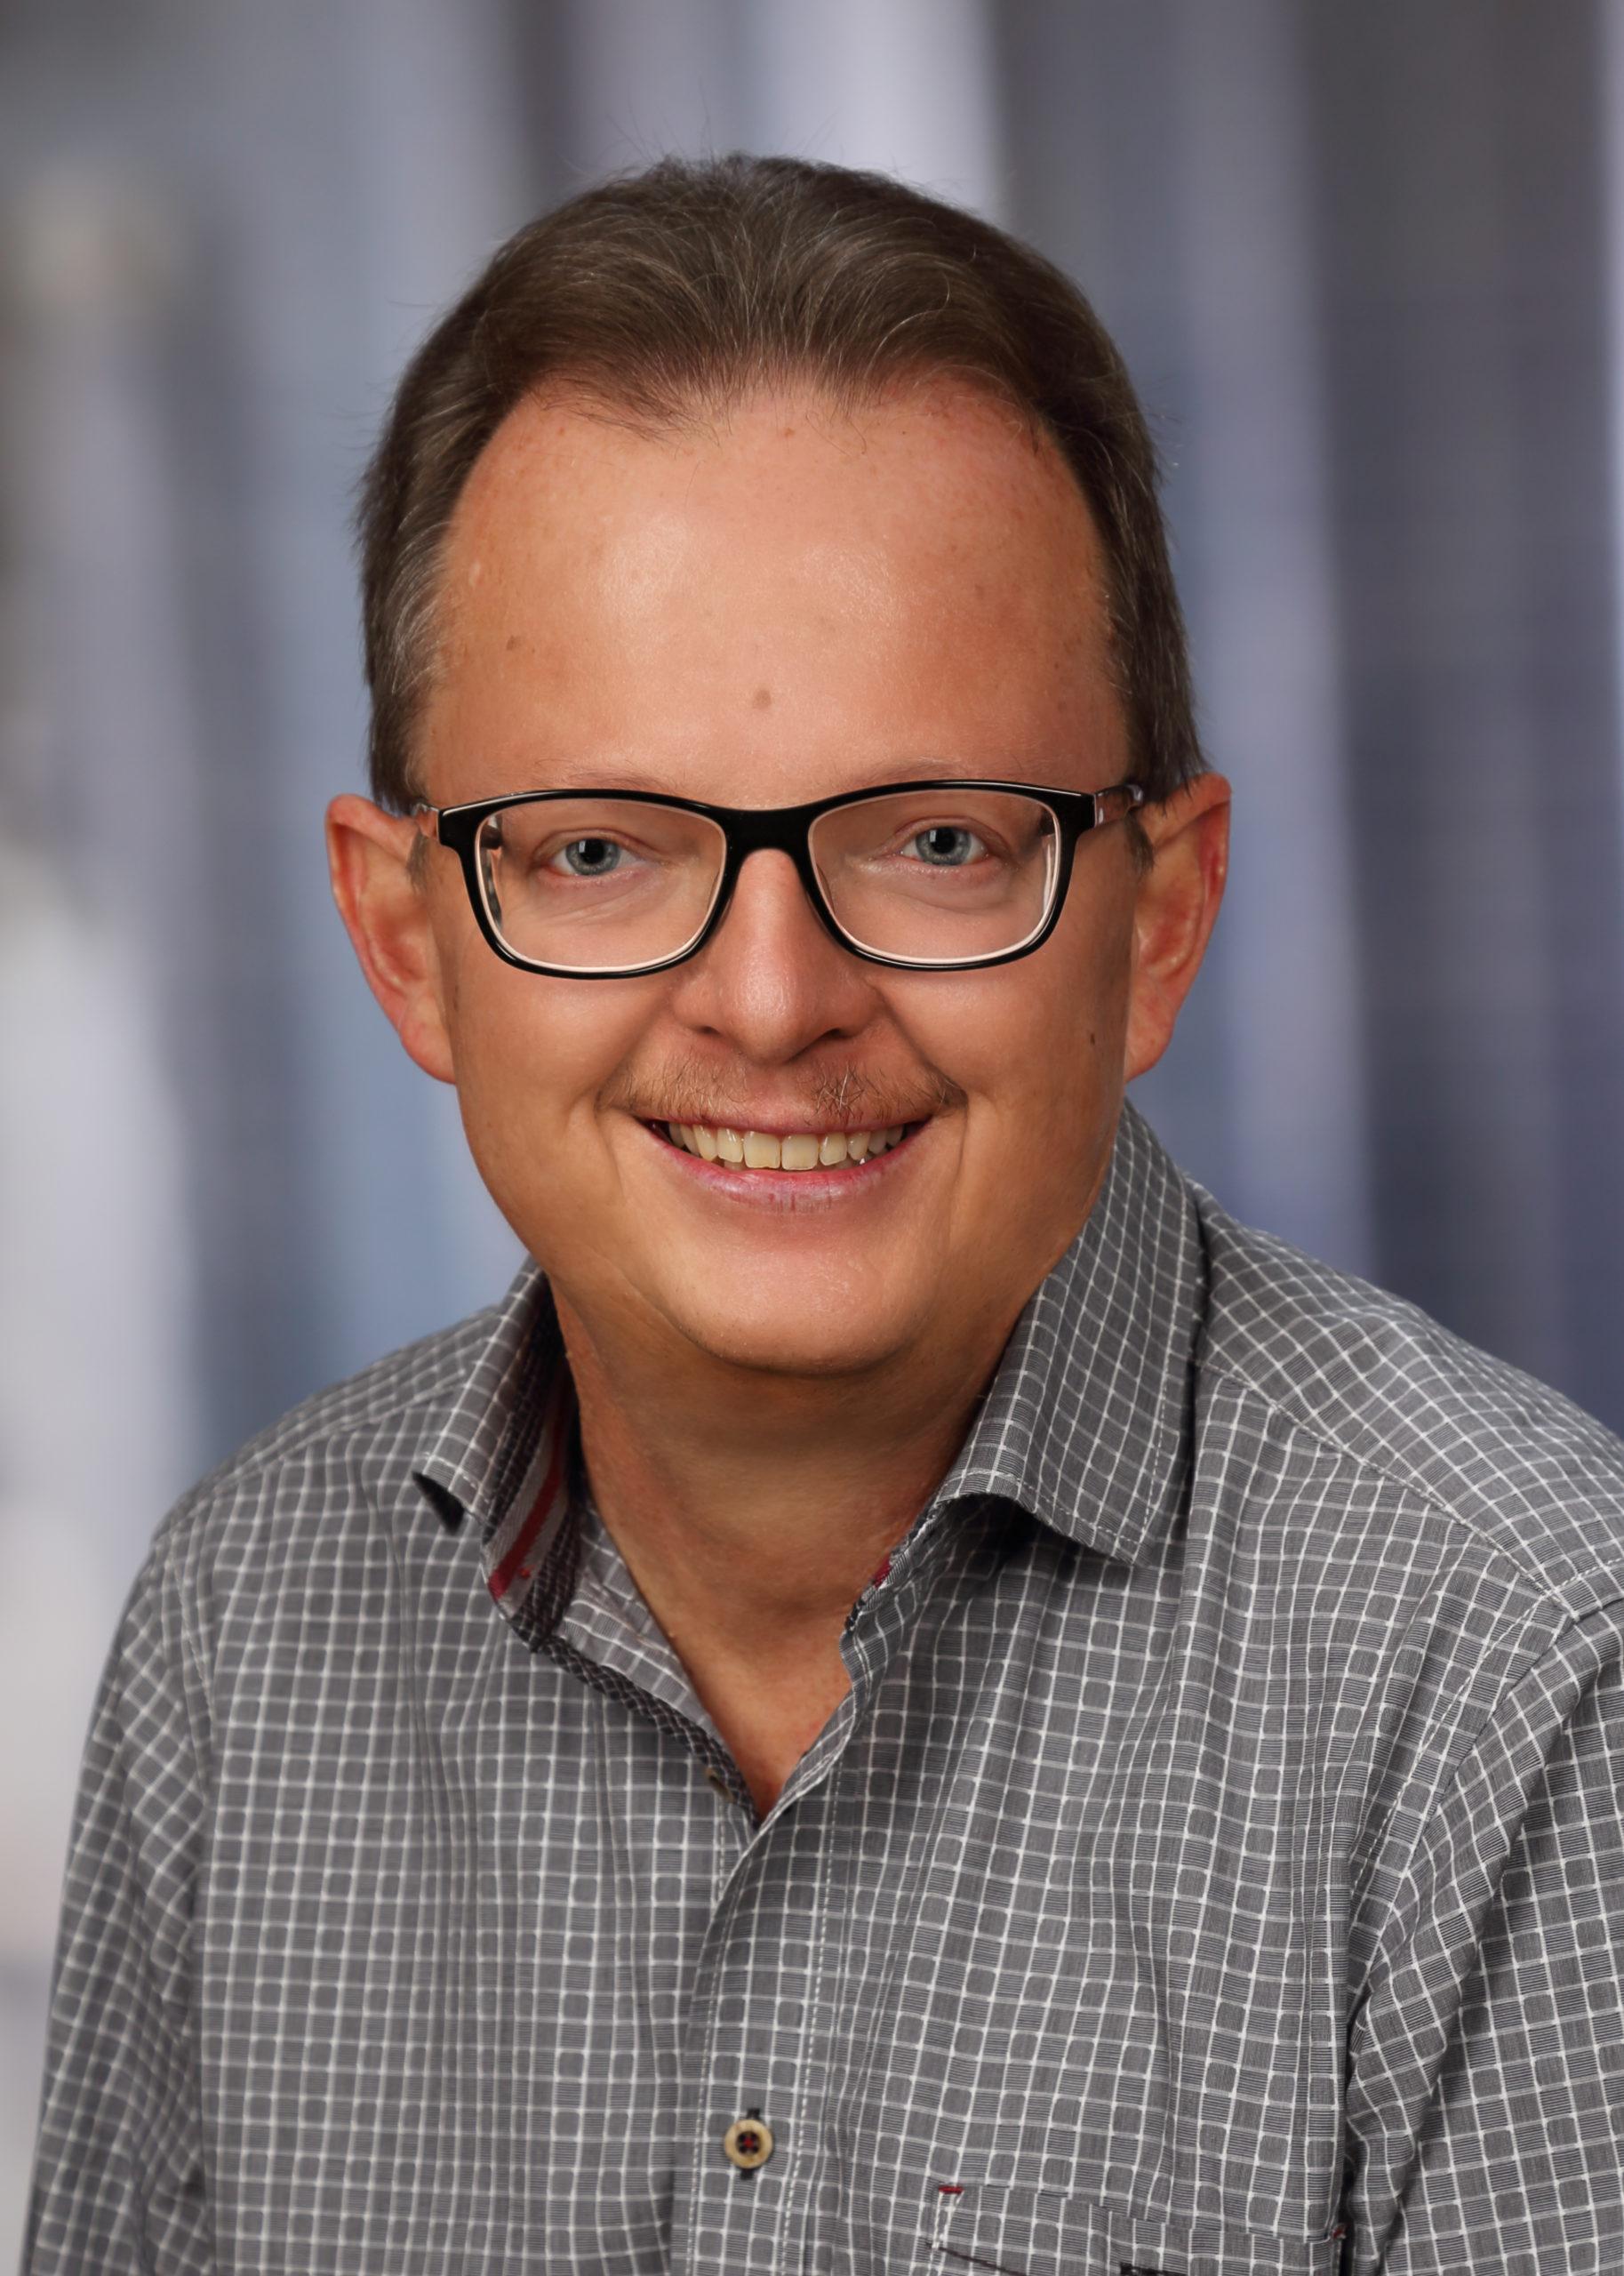 Udo Kurpiela